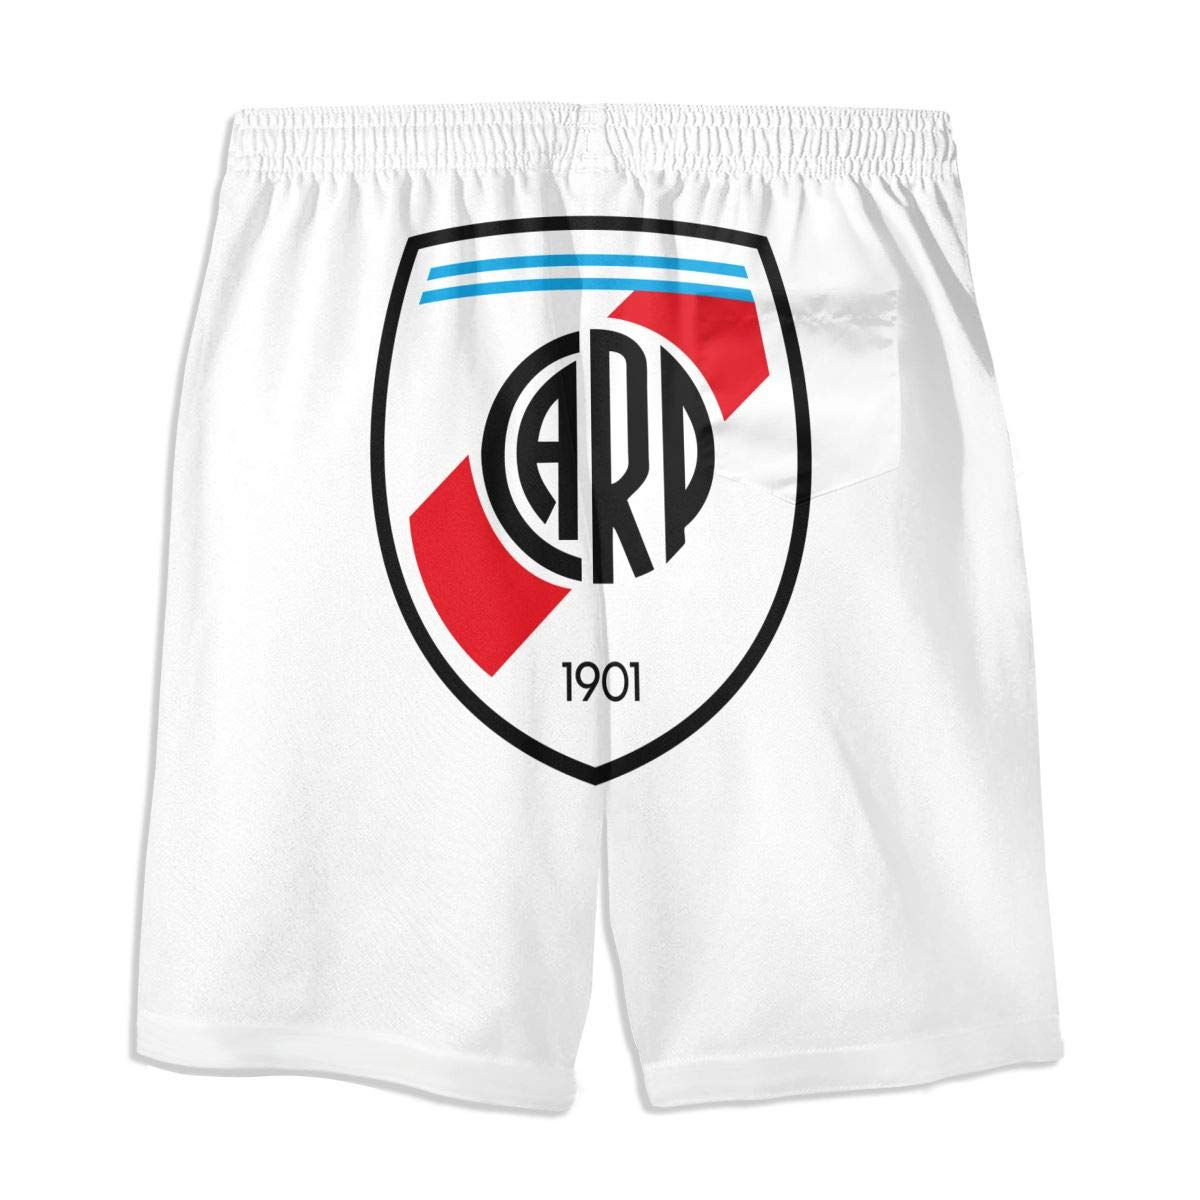 YOHHOY River Plate FC Teenager Boys Funny Swim Trunks Quick Dry Beachwear Shorts Waterproof Mesh Swimwear Bathing Suits